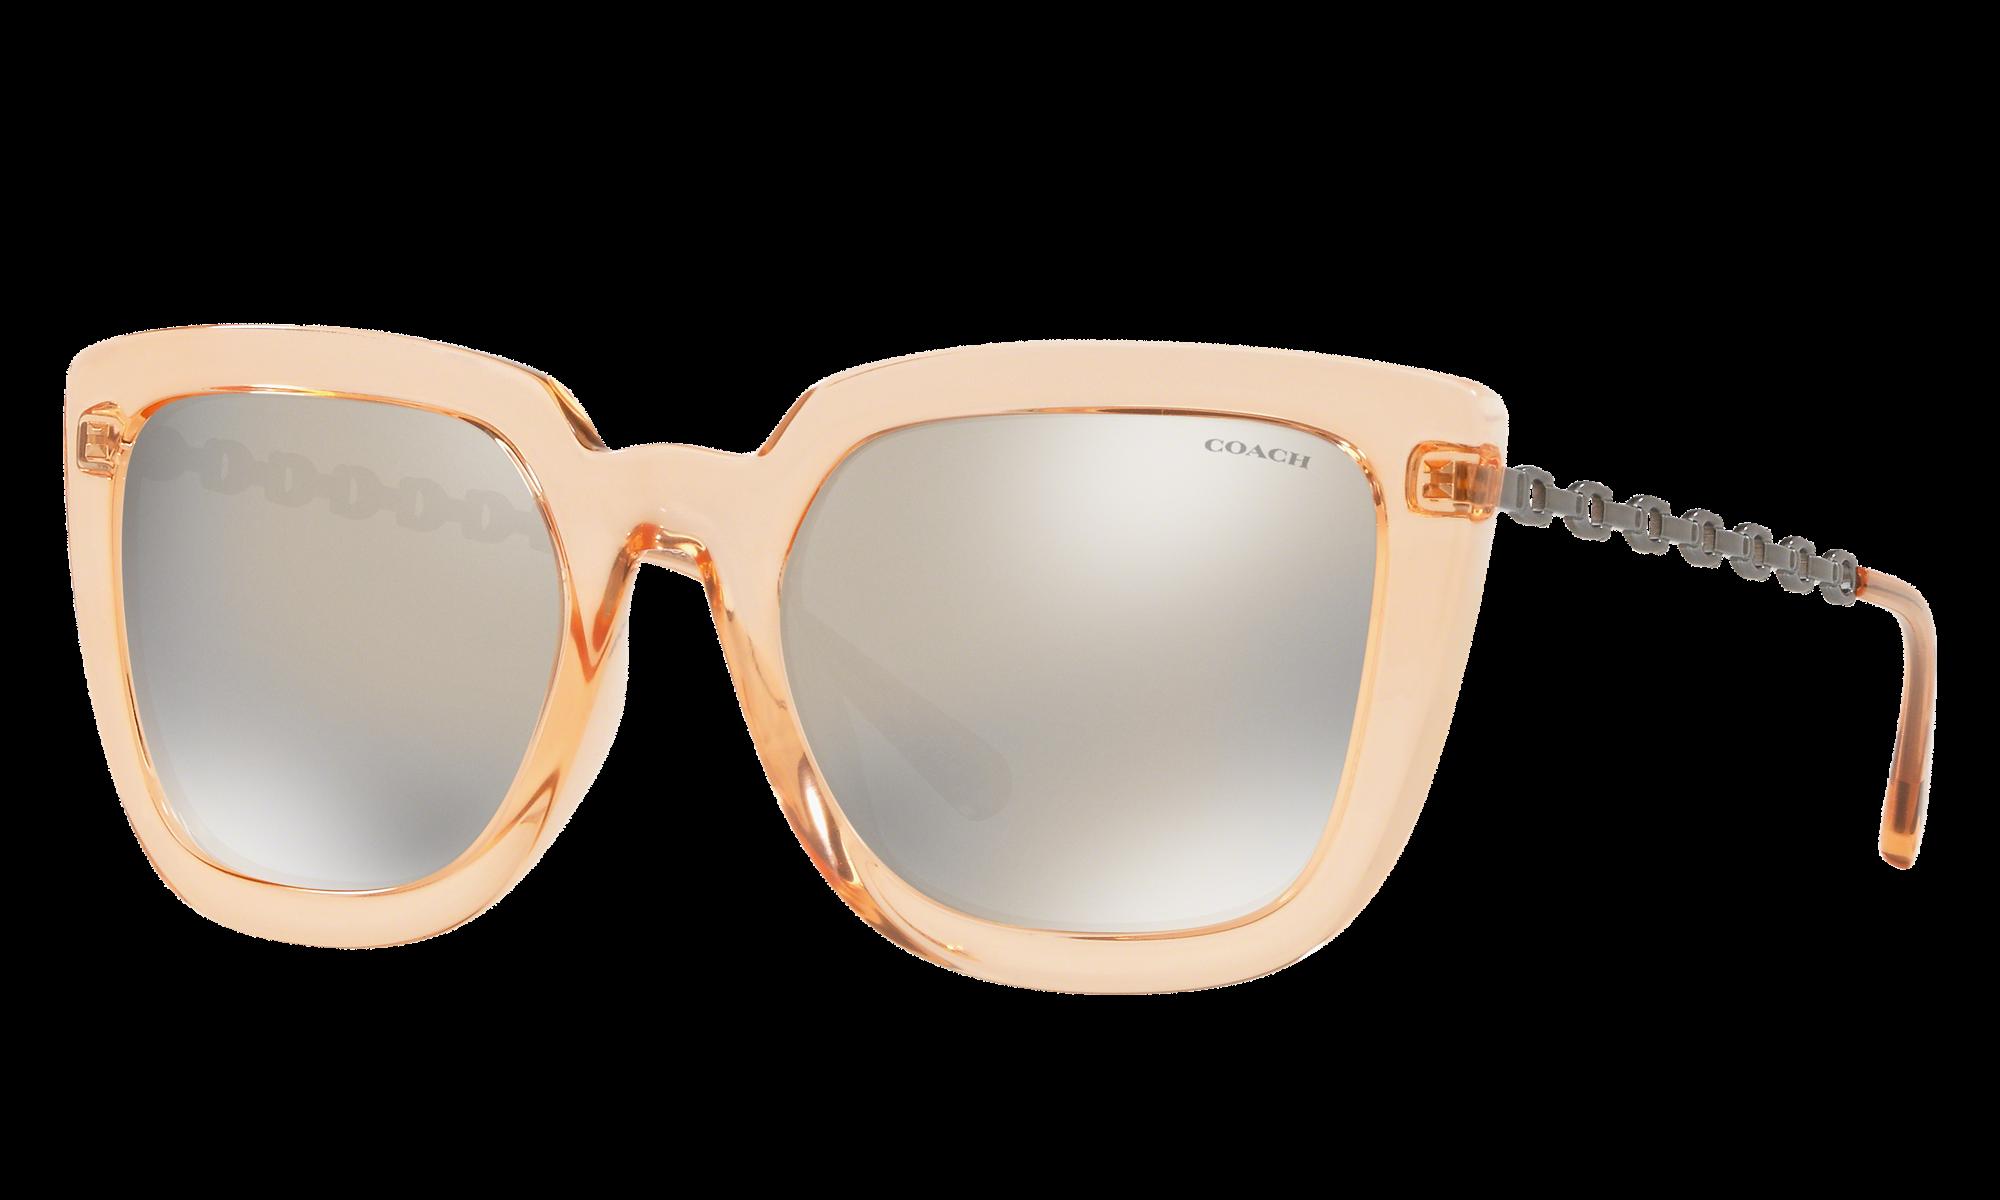 Coach L1064 Pink Sunglasses | Glasses.com® | Free Shipping